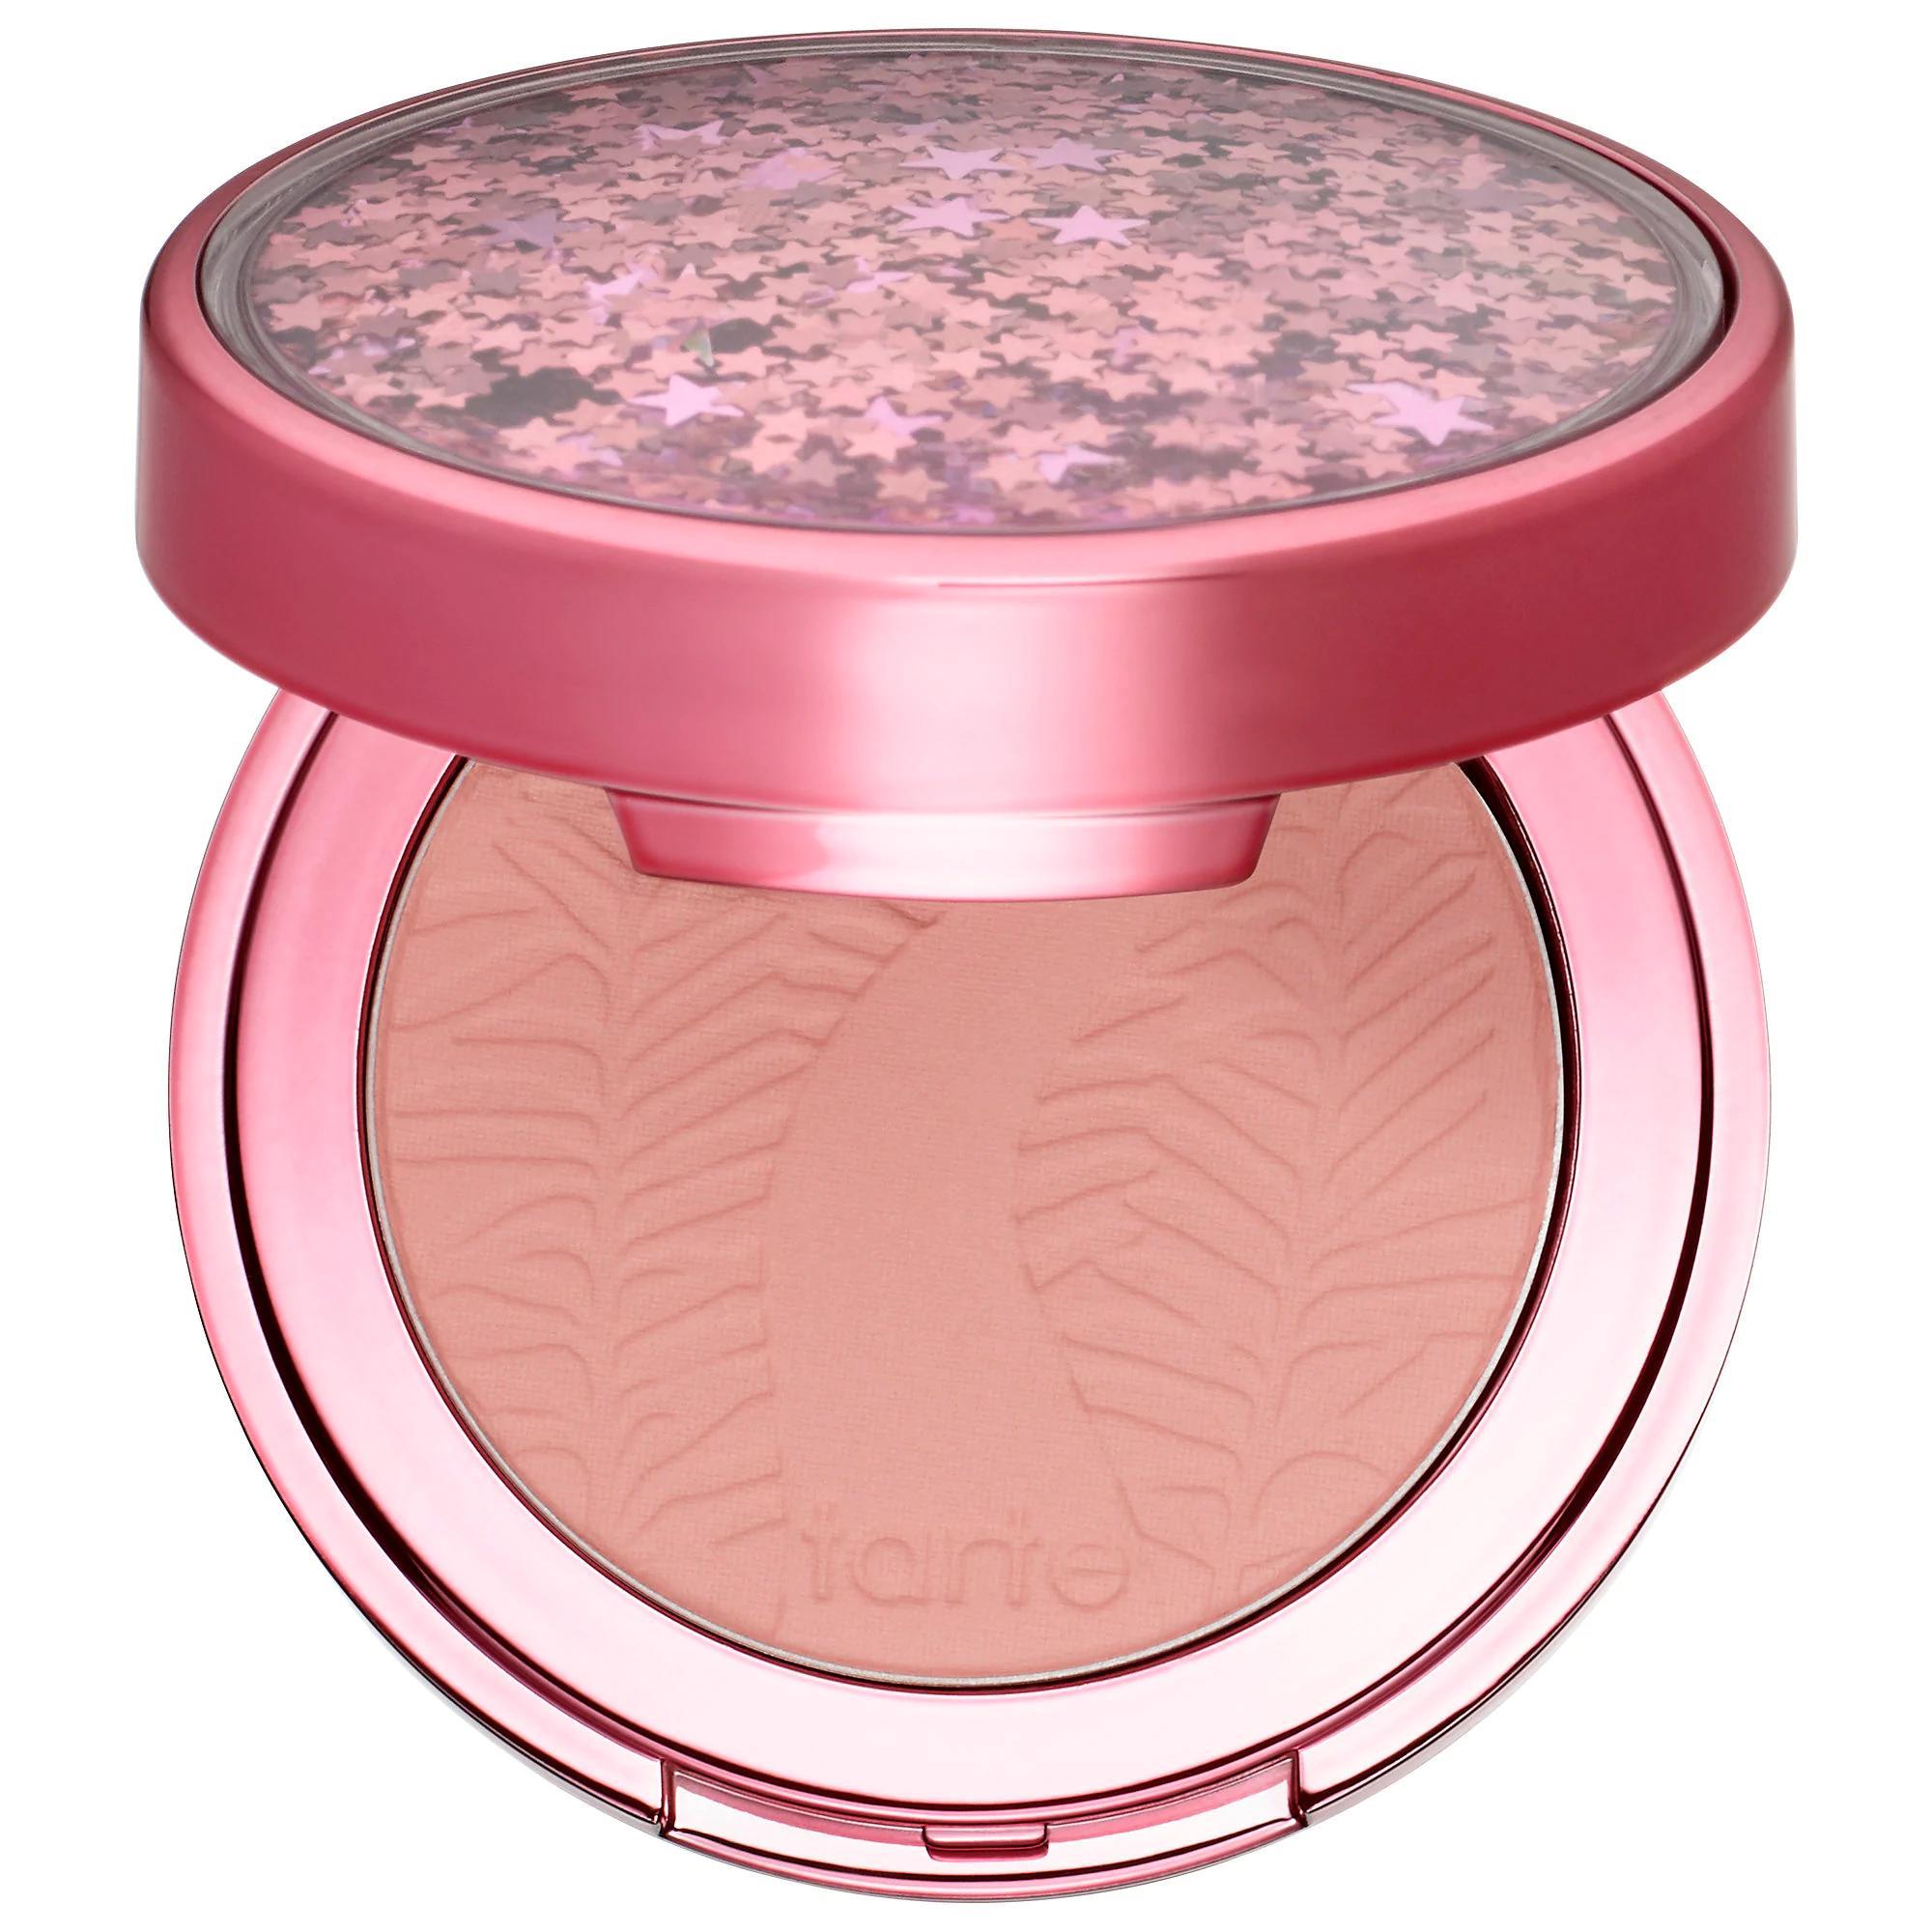 Tarte Amazonian Clay 12-Hour Blush Fairy Flush